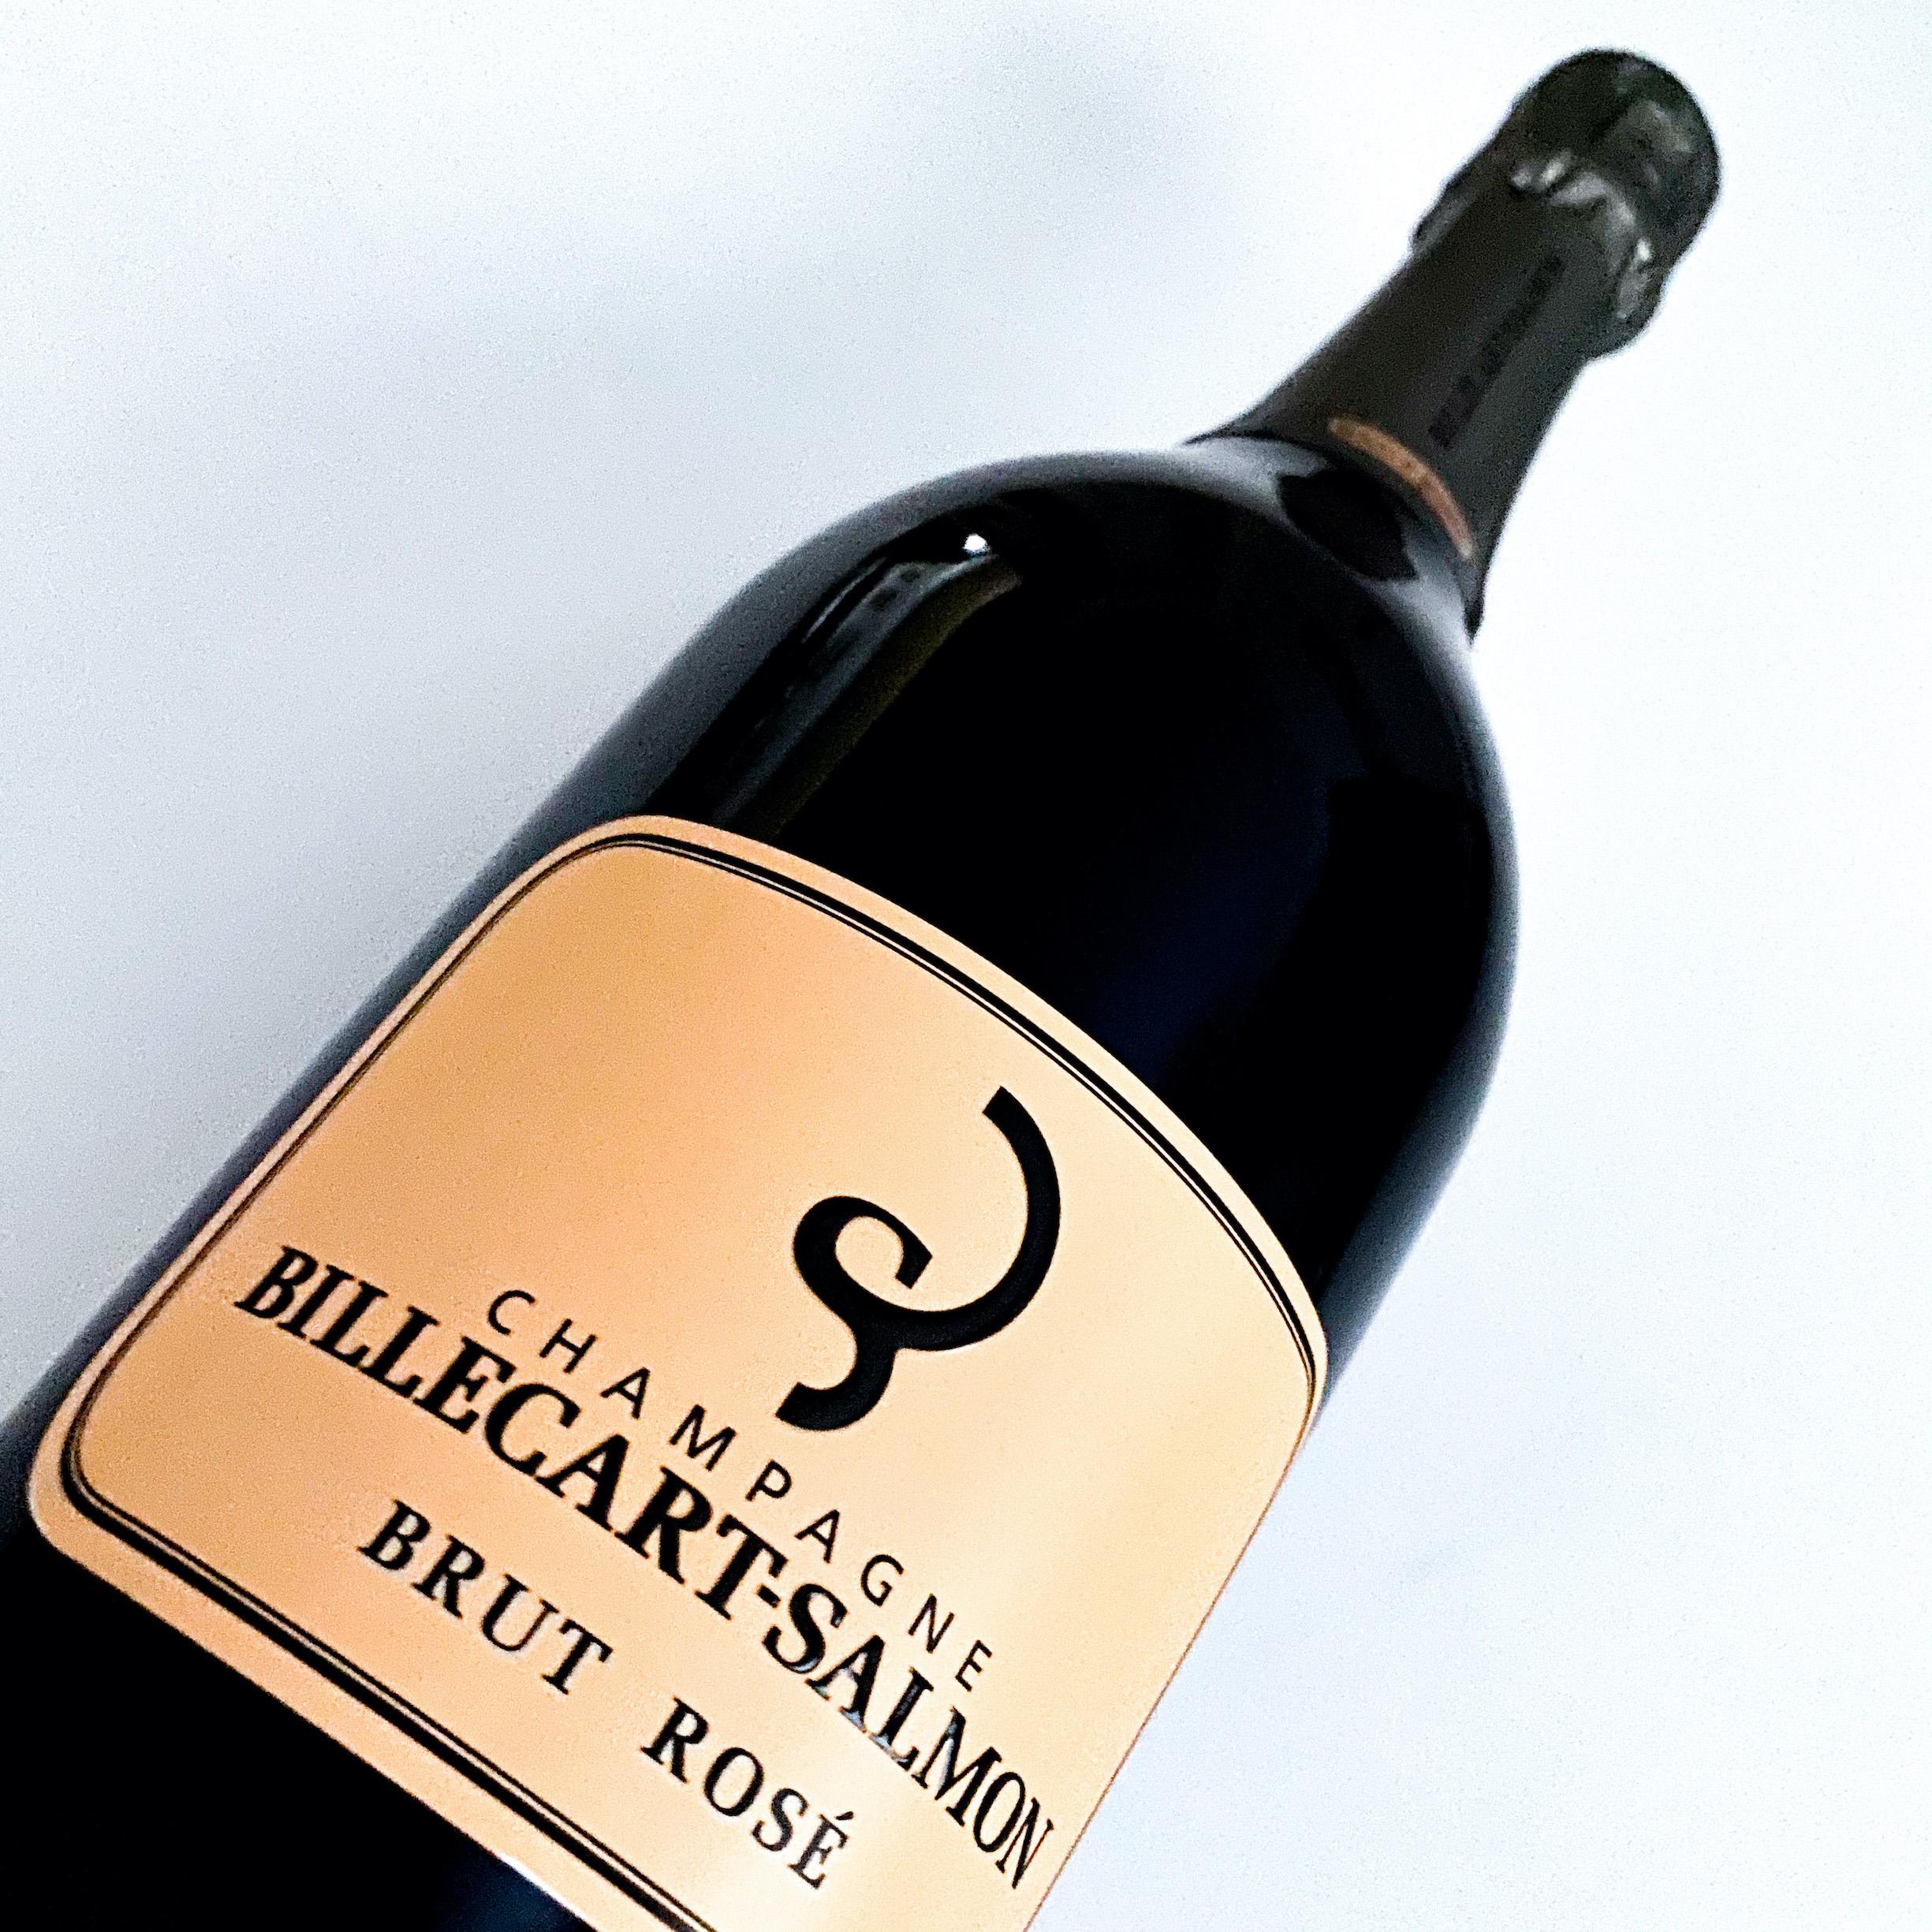 Billecart Rosé Champagne